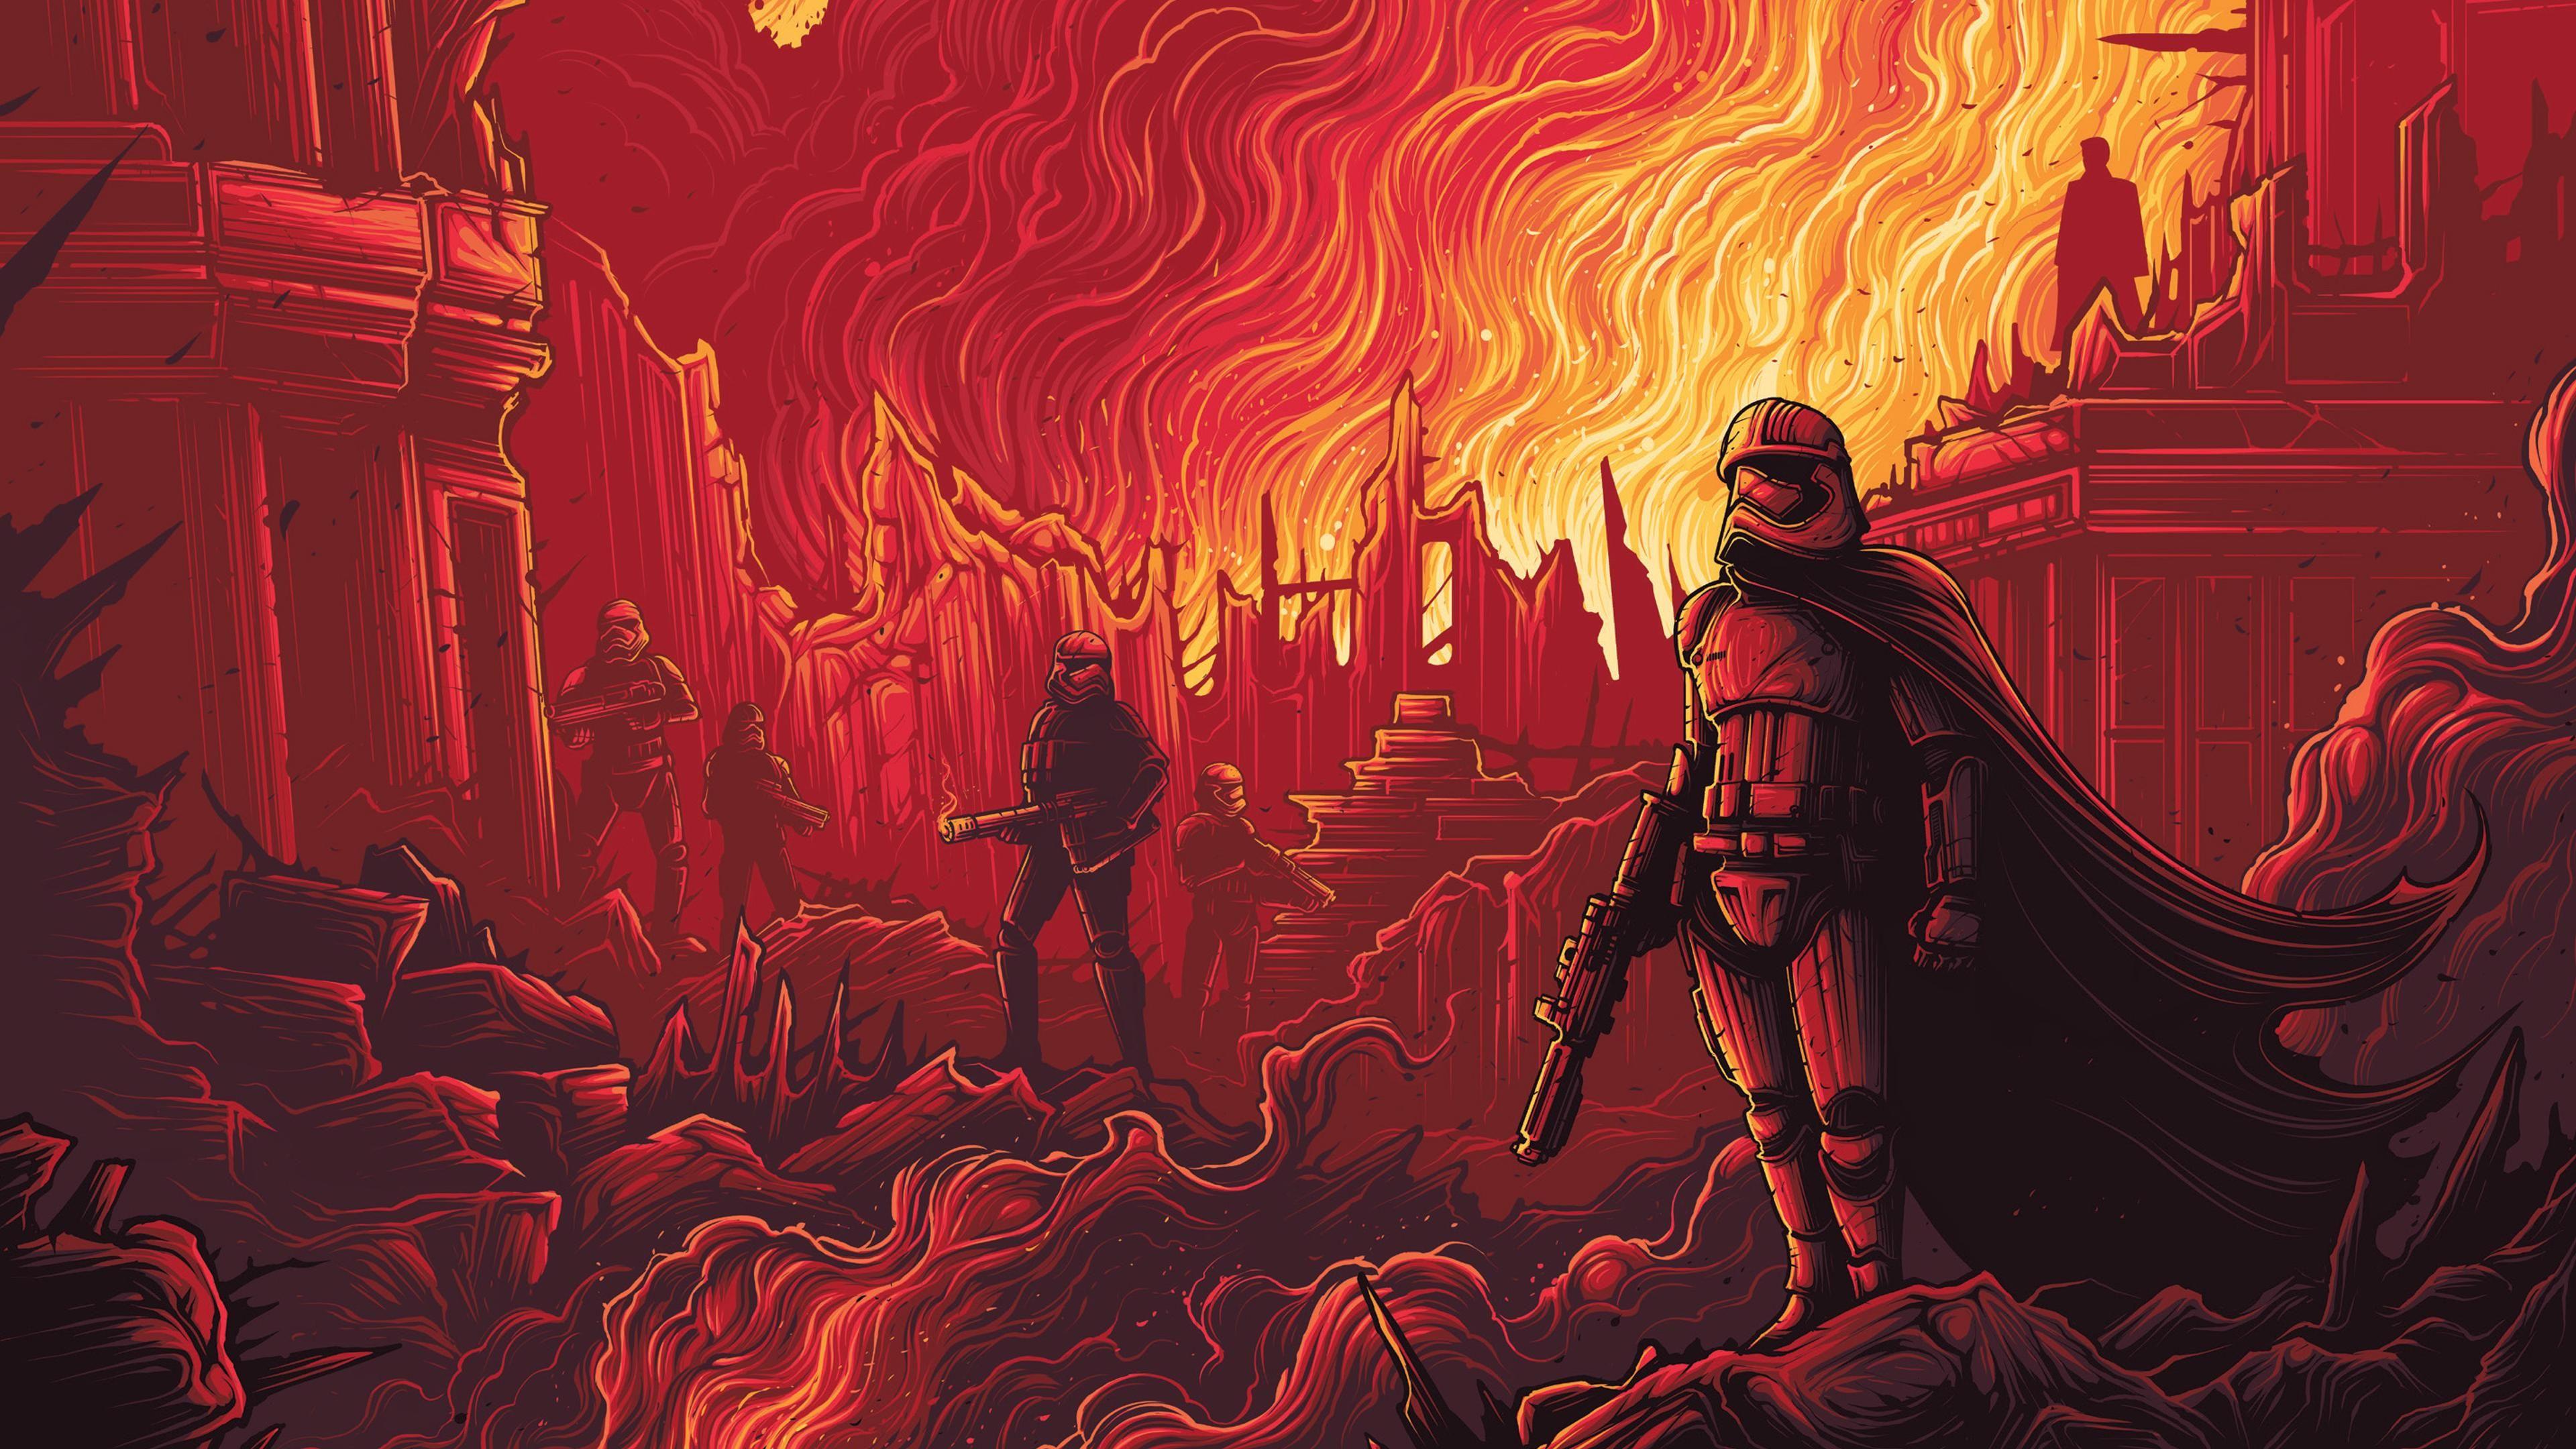 The Force Awakens IMAX Wallpapers 3840x2160 (4K) Arte